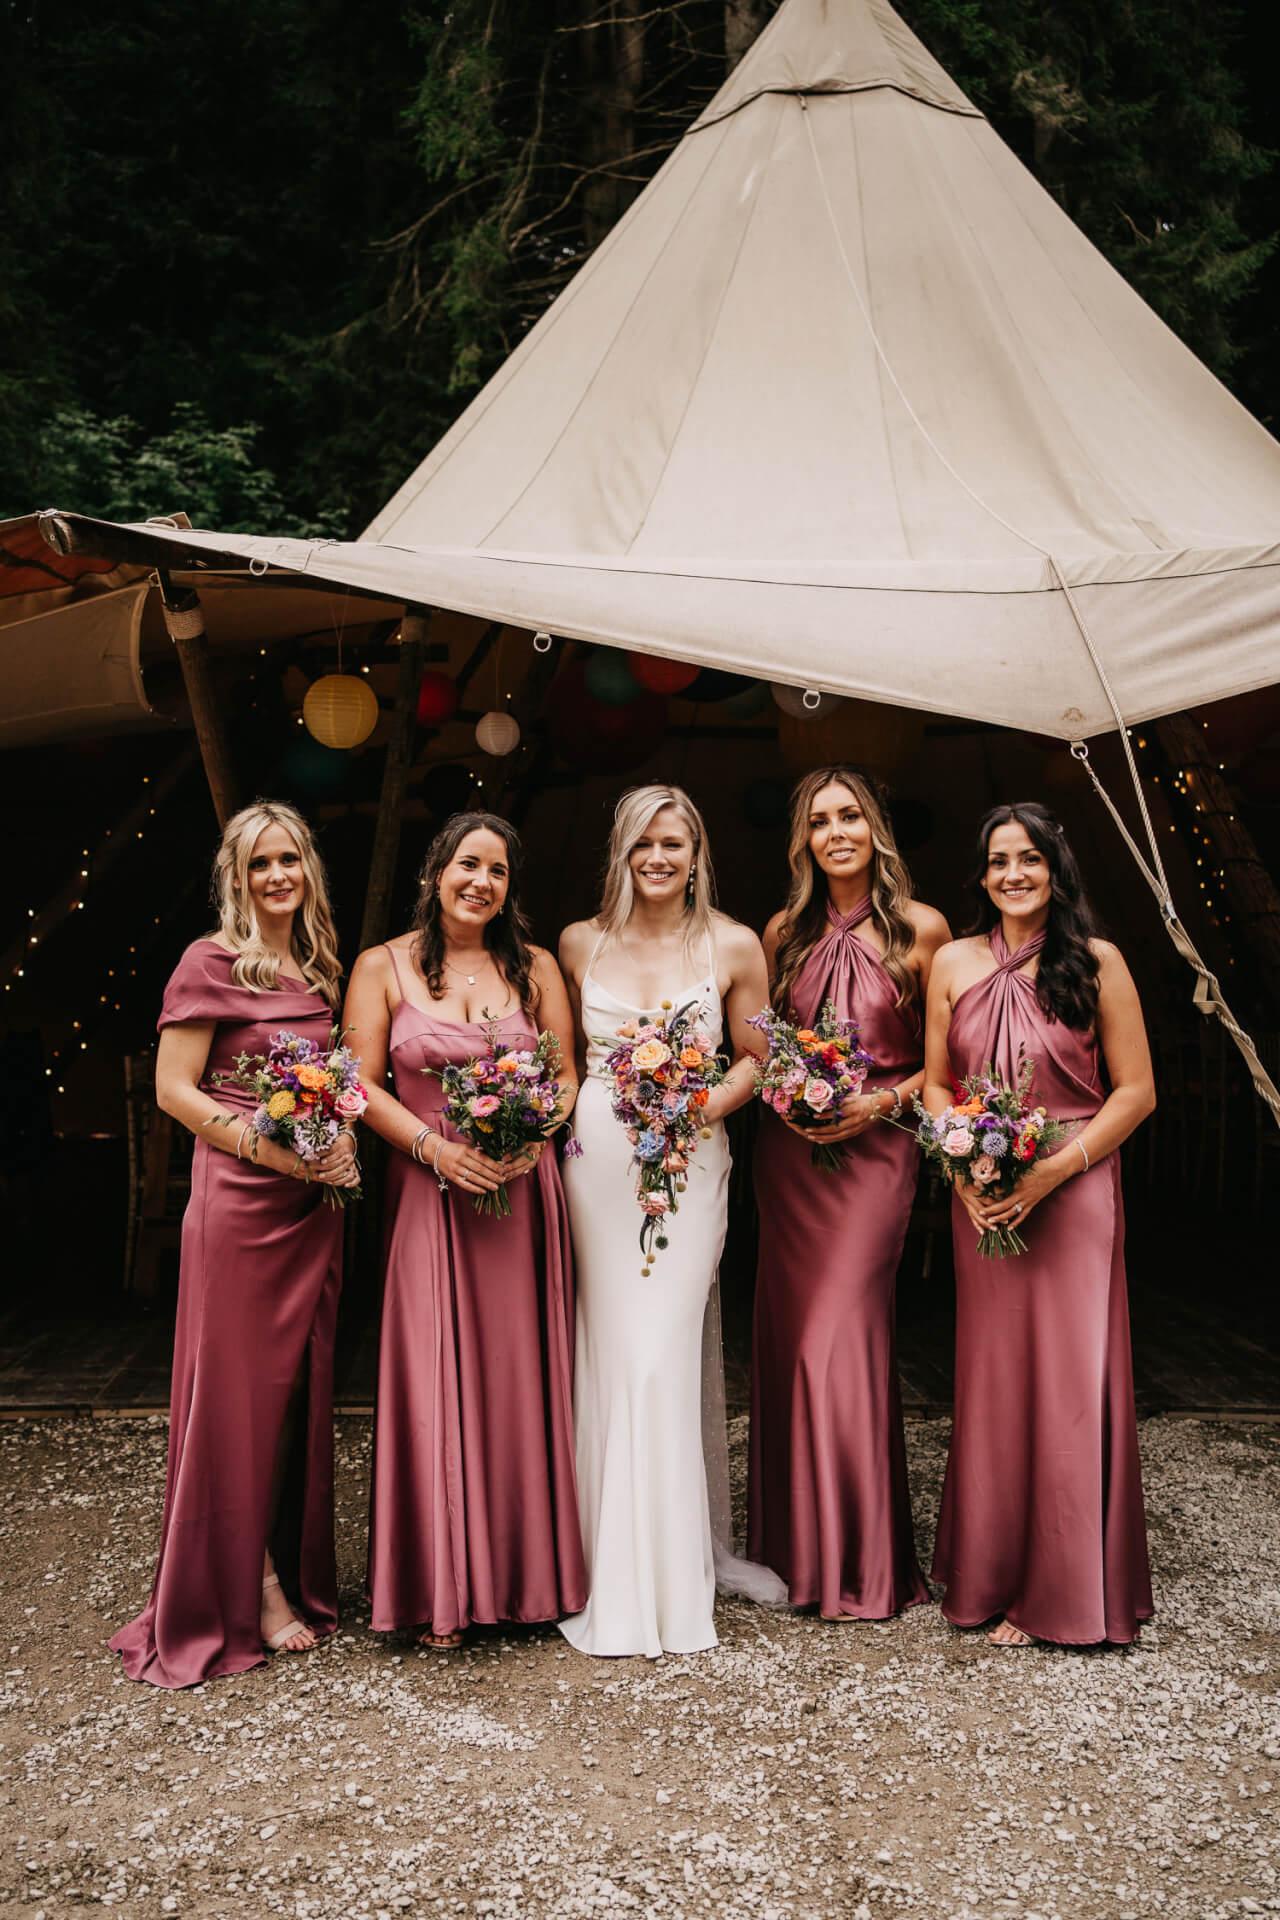 Bride and her bridesmaids at Gisburne Park wedding